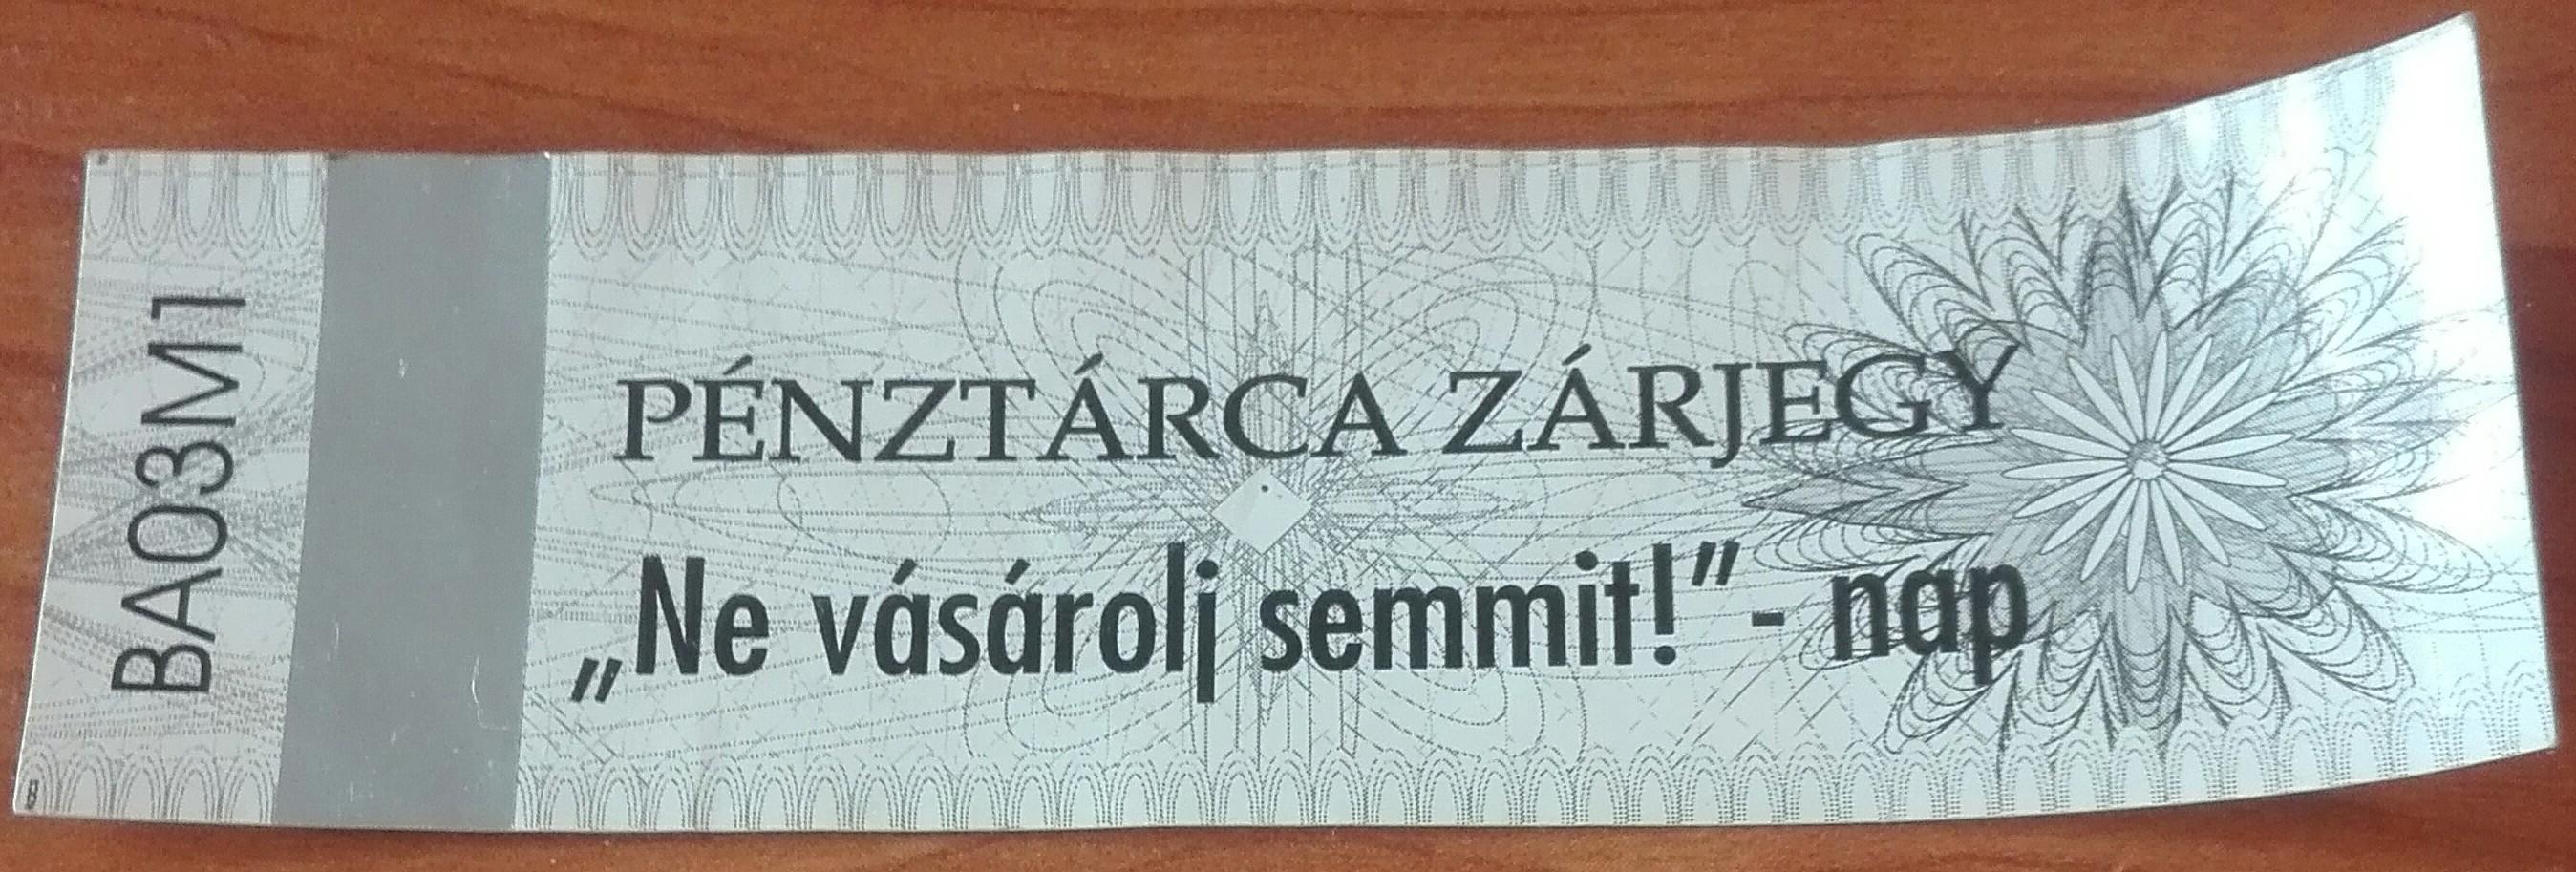 penztarca_zarjegy_bors_orig.jpg